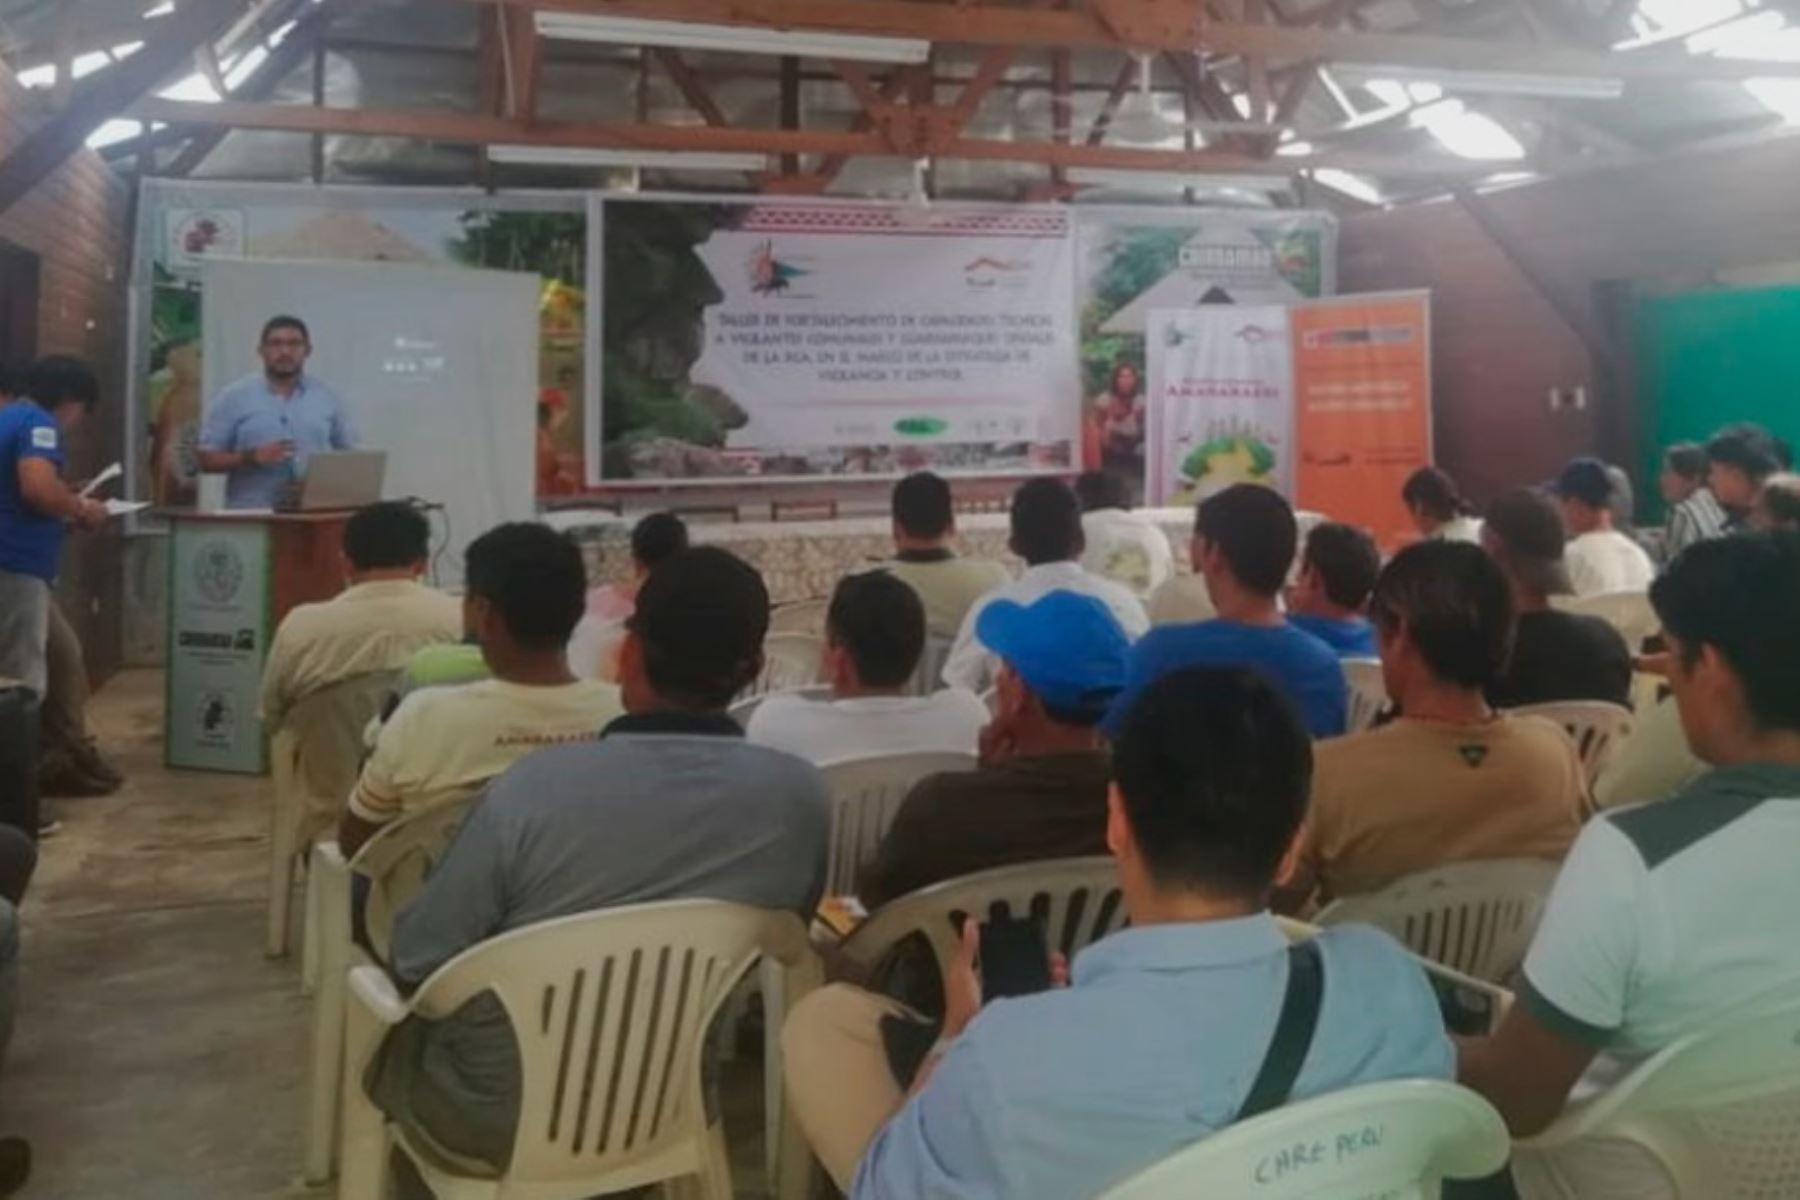 Especialistas de Indecopi informan a representantes de comunidades de Reserva Amarakaeri, Madre de Dios, sobre importancia de registrar marca colectiva.